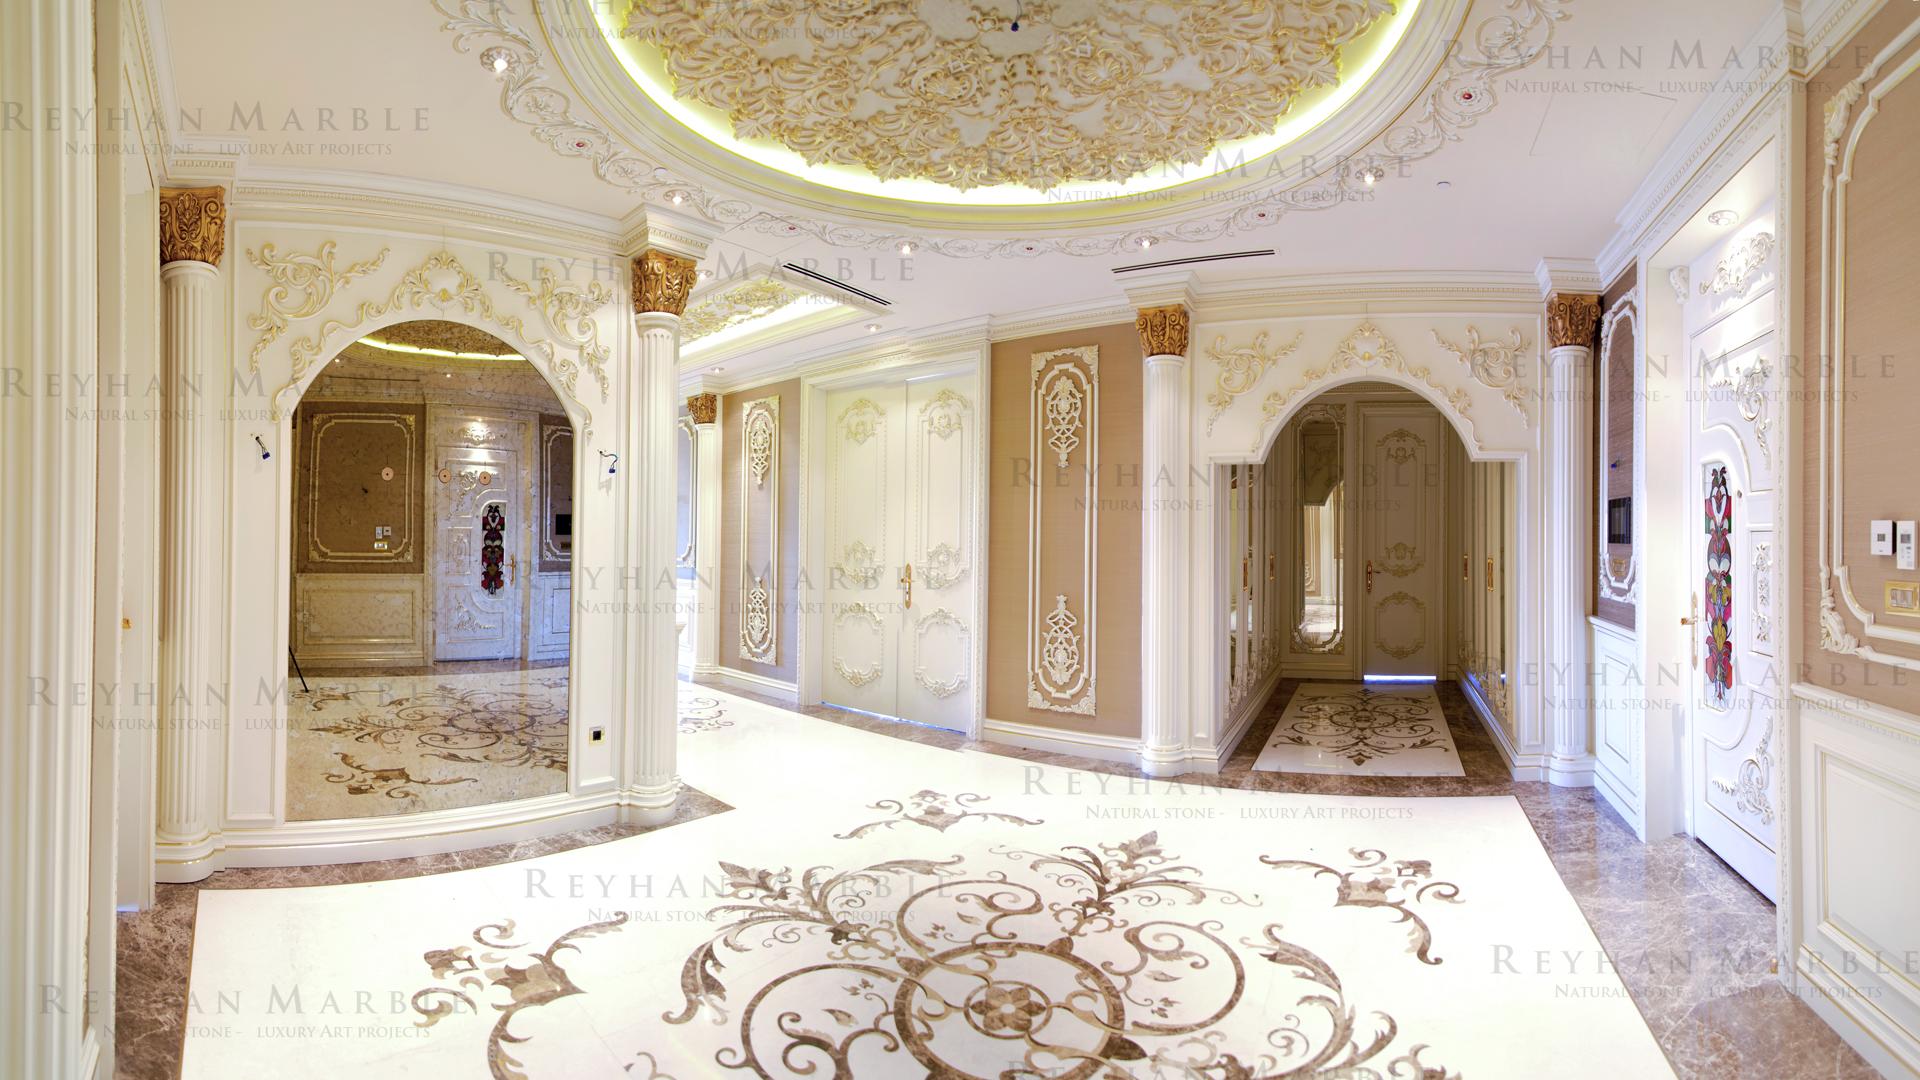 decorative marble pavement